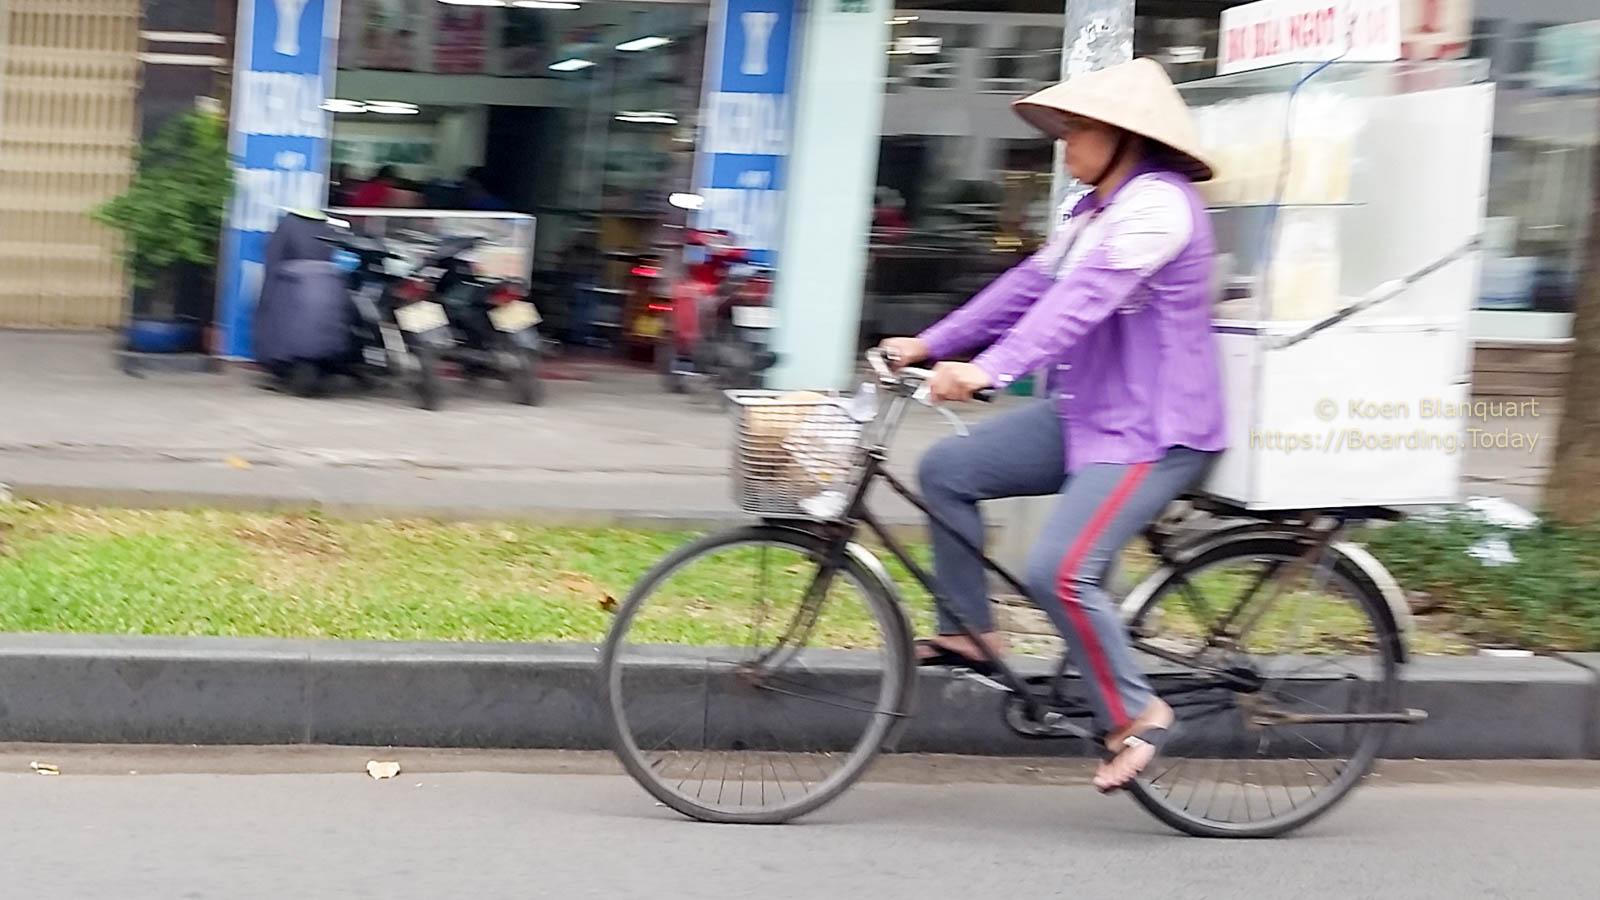 20170122-2017-01-22 10.59.41Ho Chi Minh City, Saigon, Vietnam by Koen Blanquart for Boarding.Today.jpg